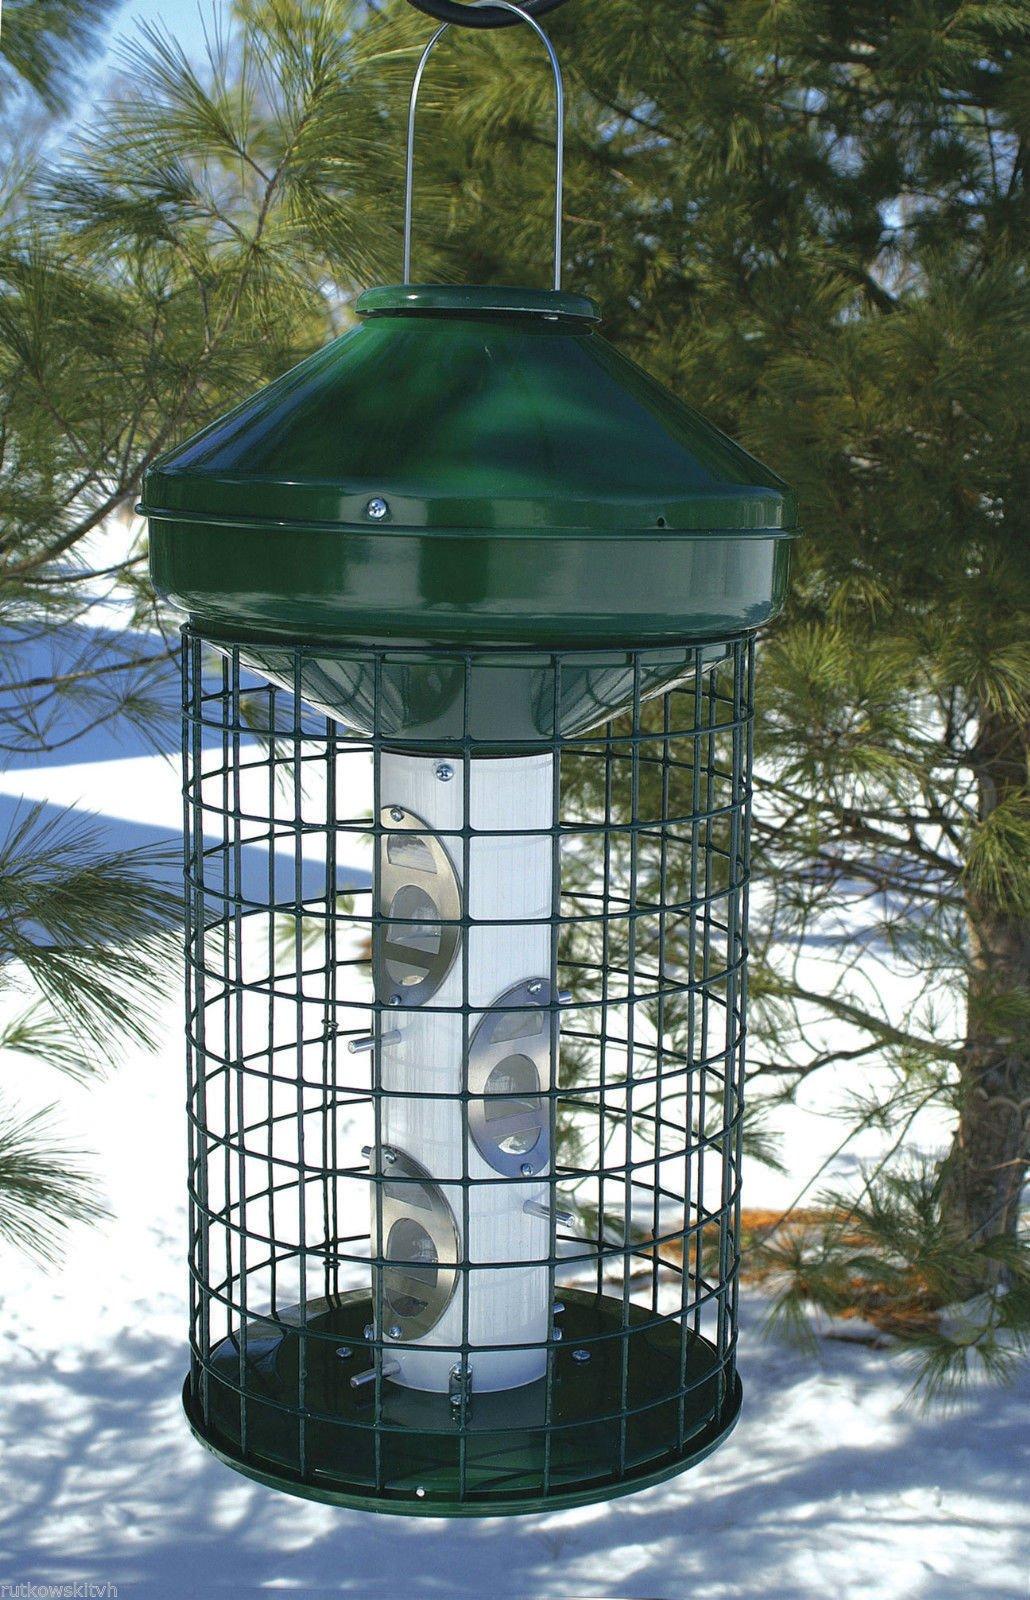 Woodlink Naav1mnp Hd Large Capacity Caged Mixed Seed Bird Feeder